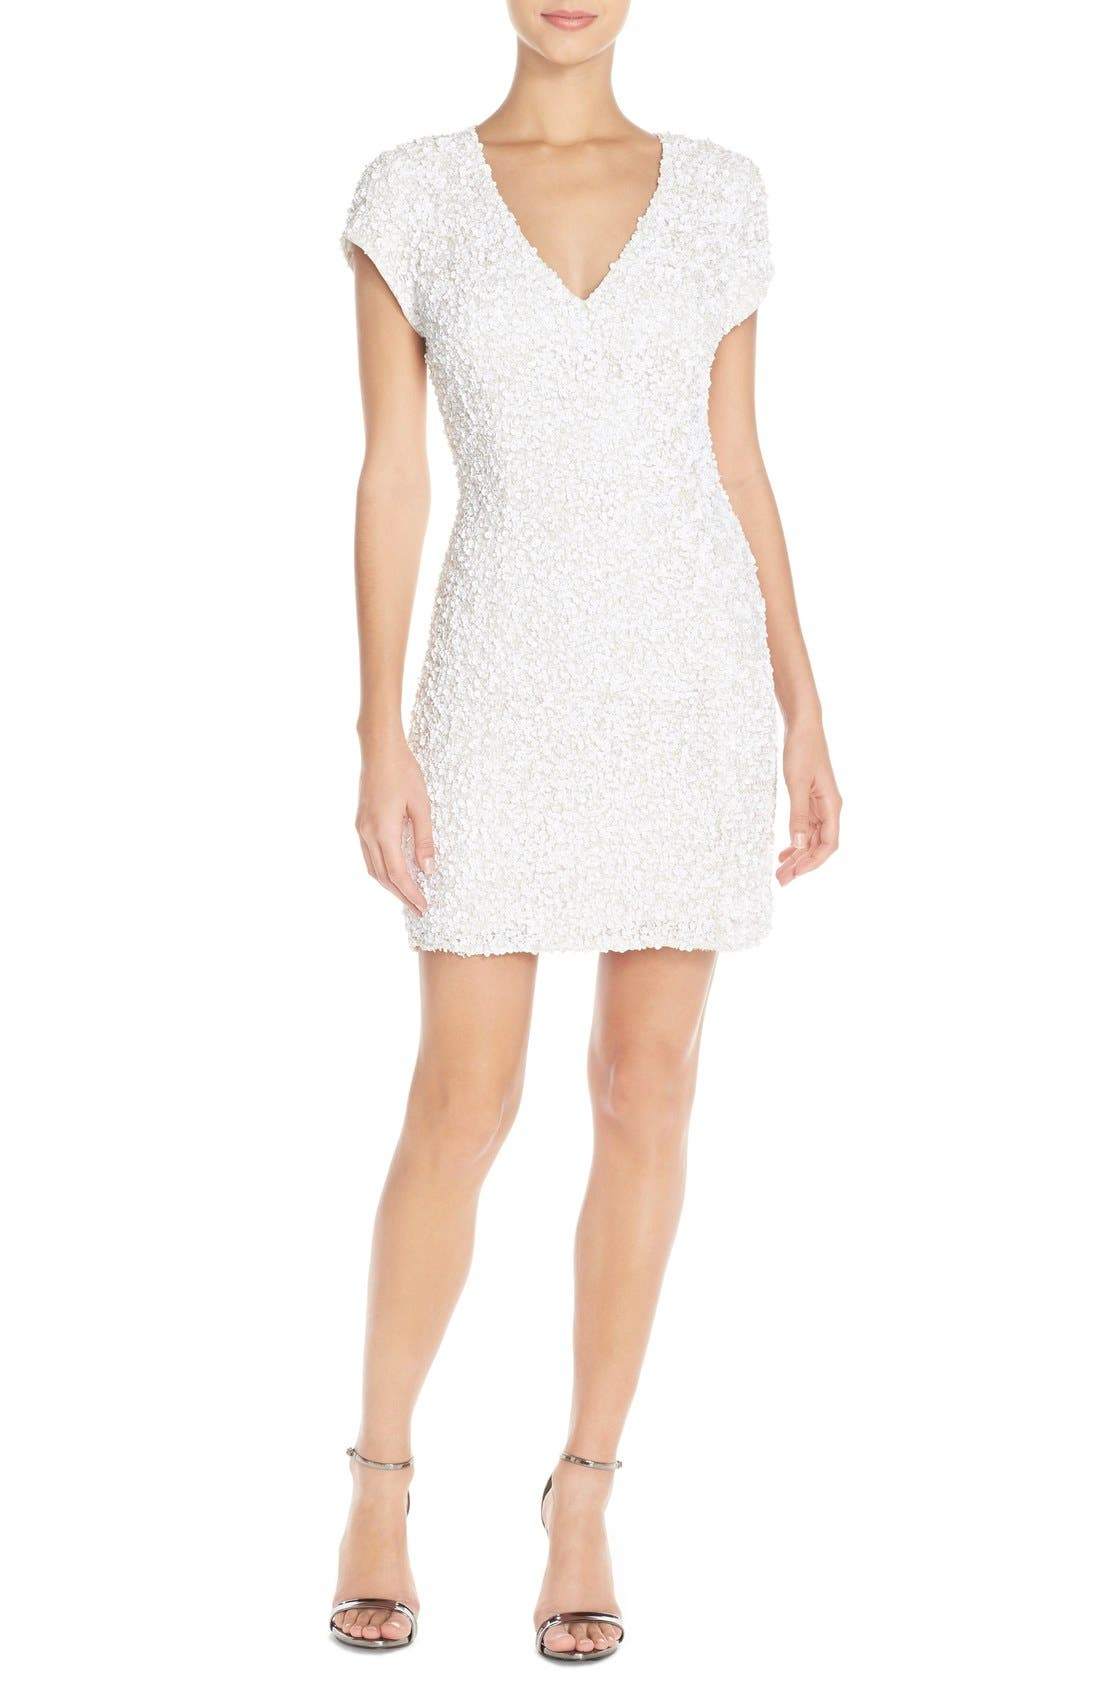 Alternate Image 1 Selected - Parker Black 'Serena' Sequin Silk Body-Con Dress